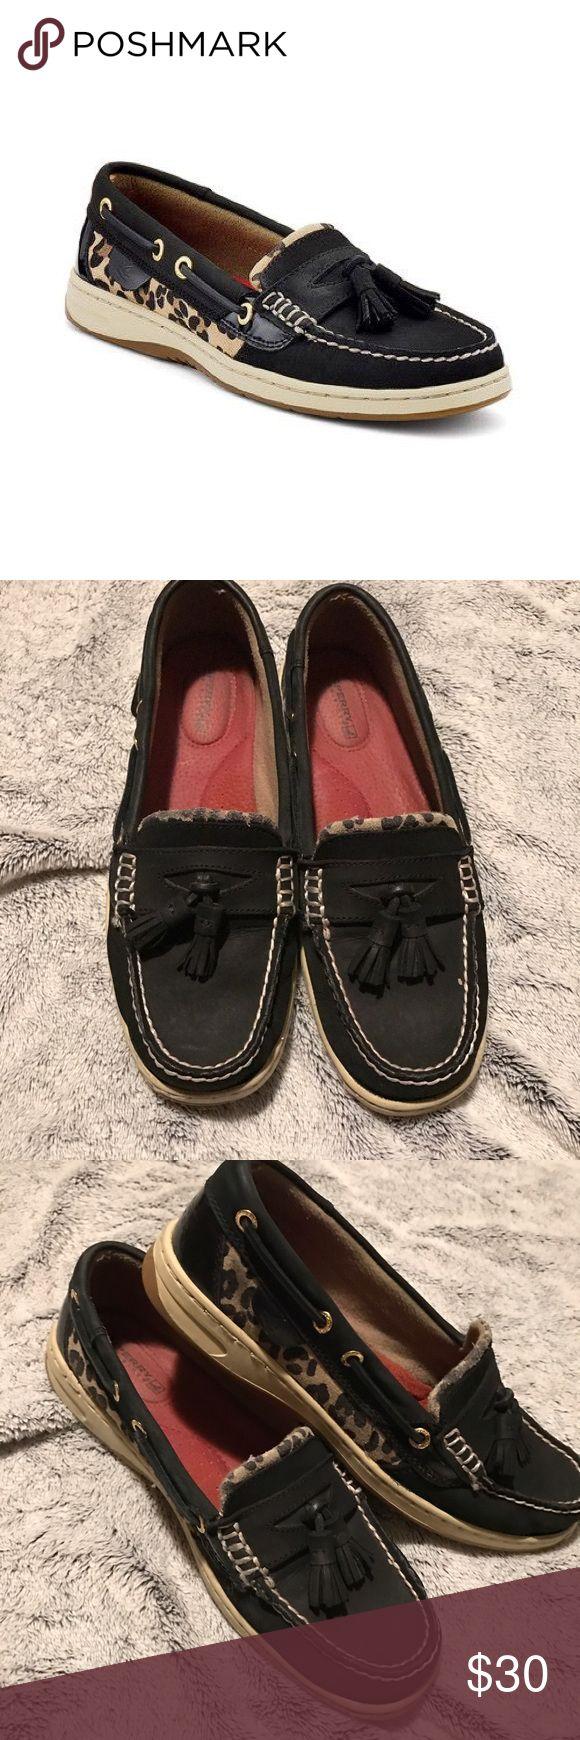 "Leopard Sperrys Leopard sperrys leather ""tasslefish"" good condition Sperry Shoes"